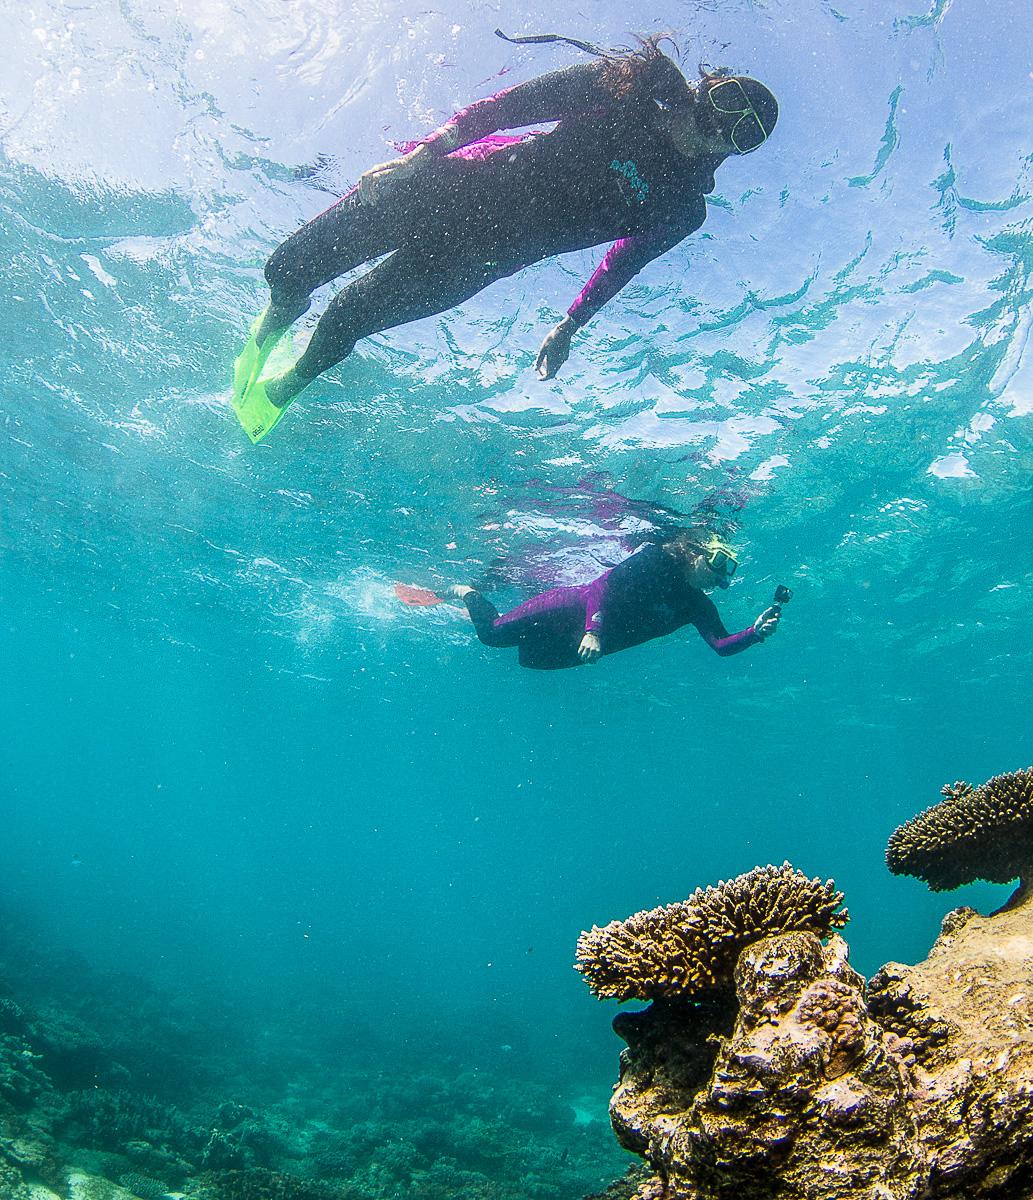 schnorcheln-korallenriff-ningaloo-reef